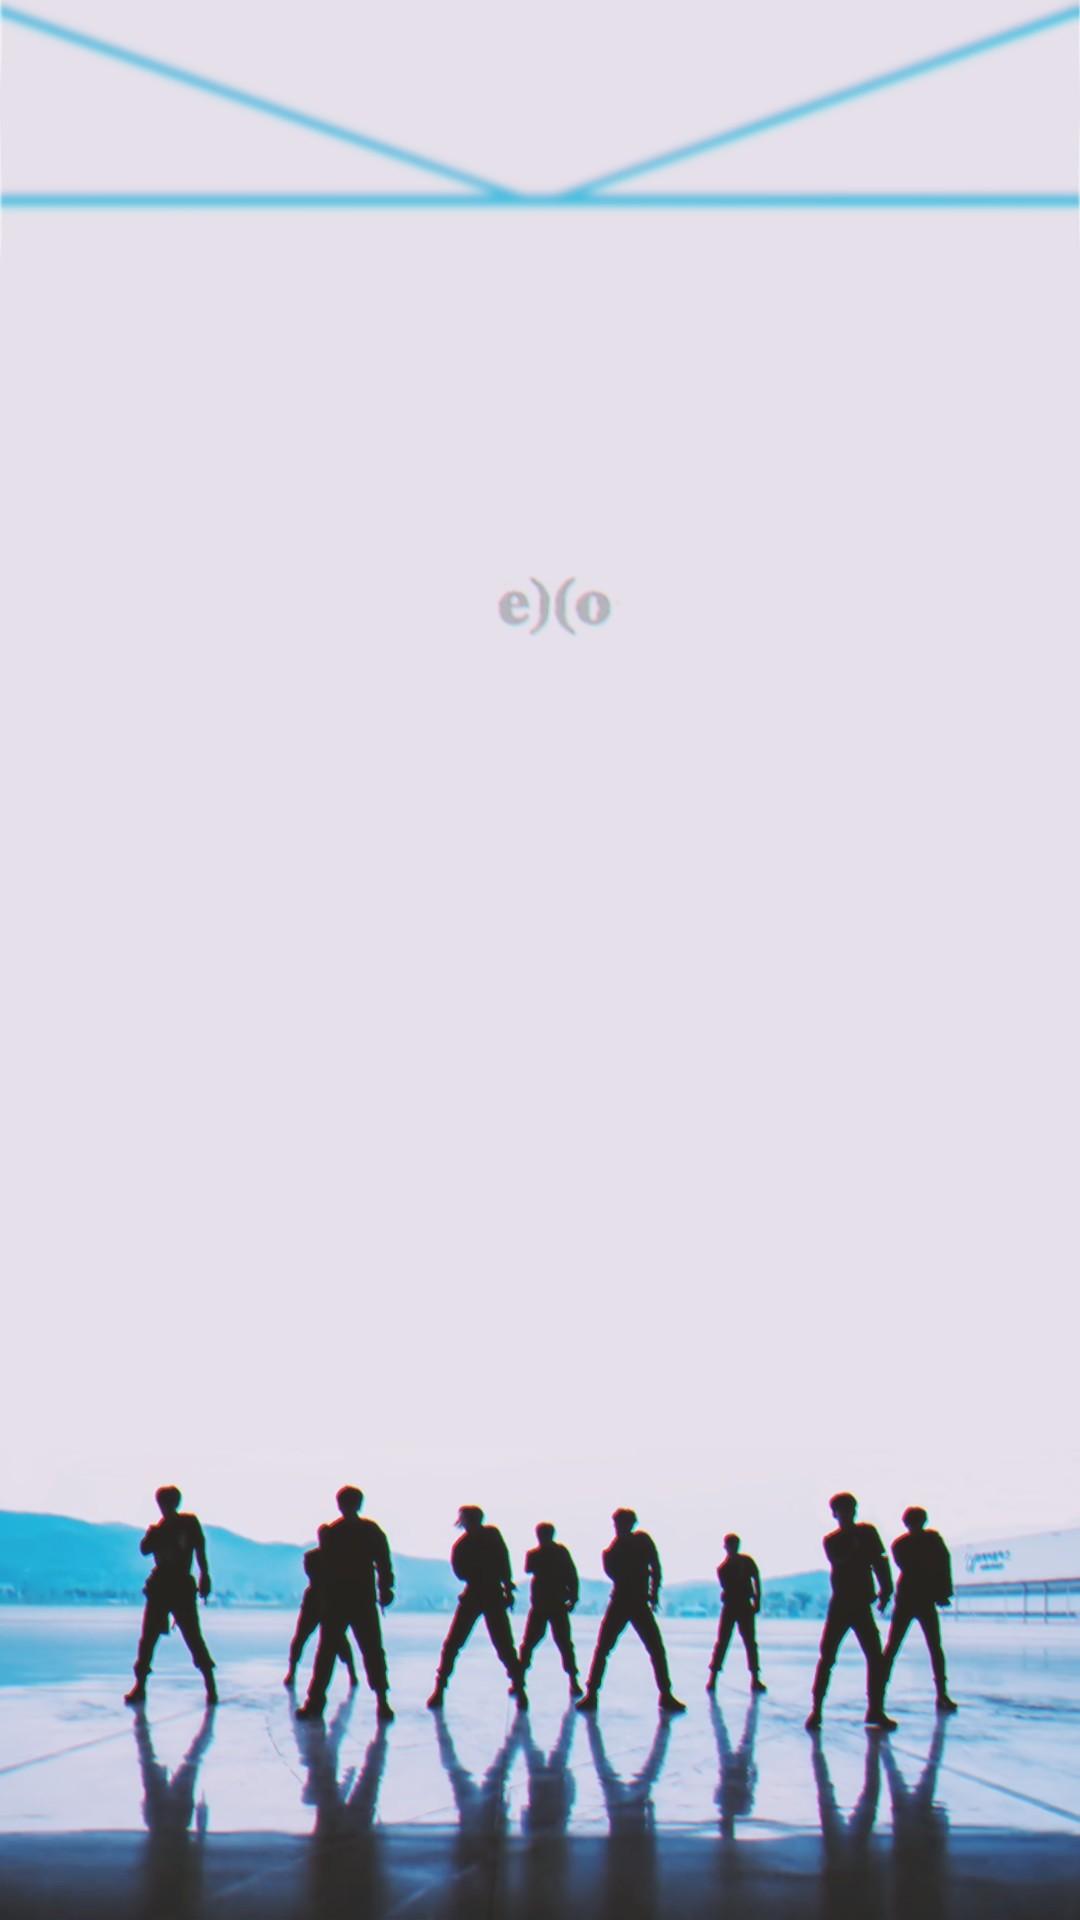 Exo iPhone 5 wallpaper